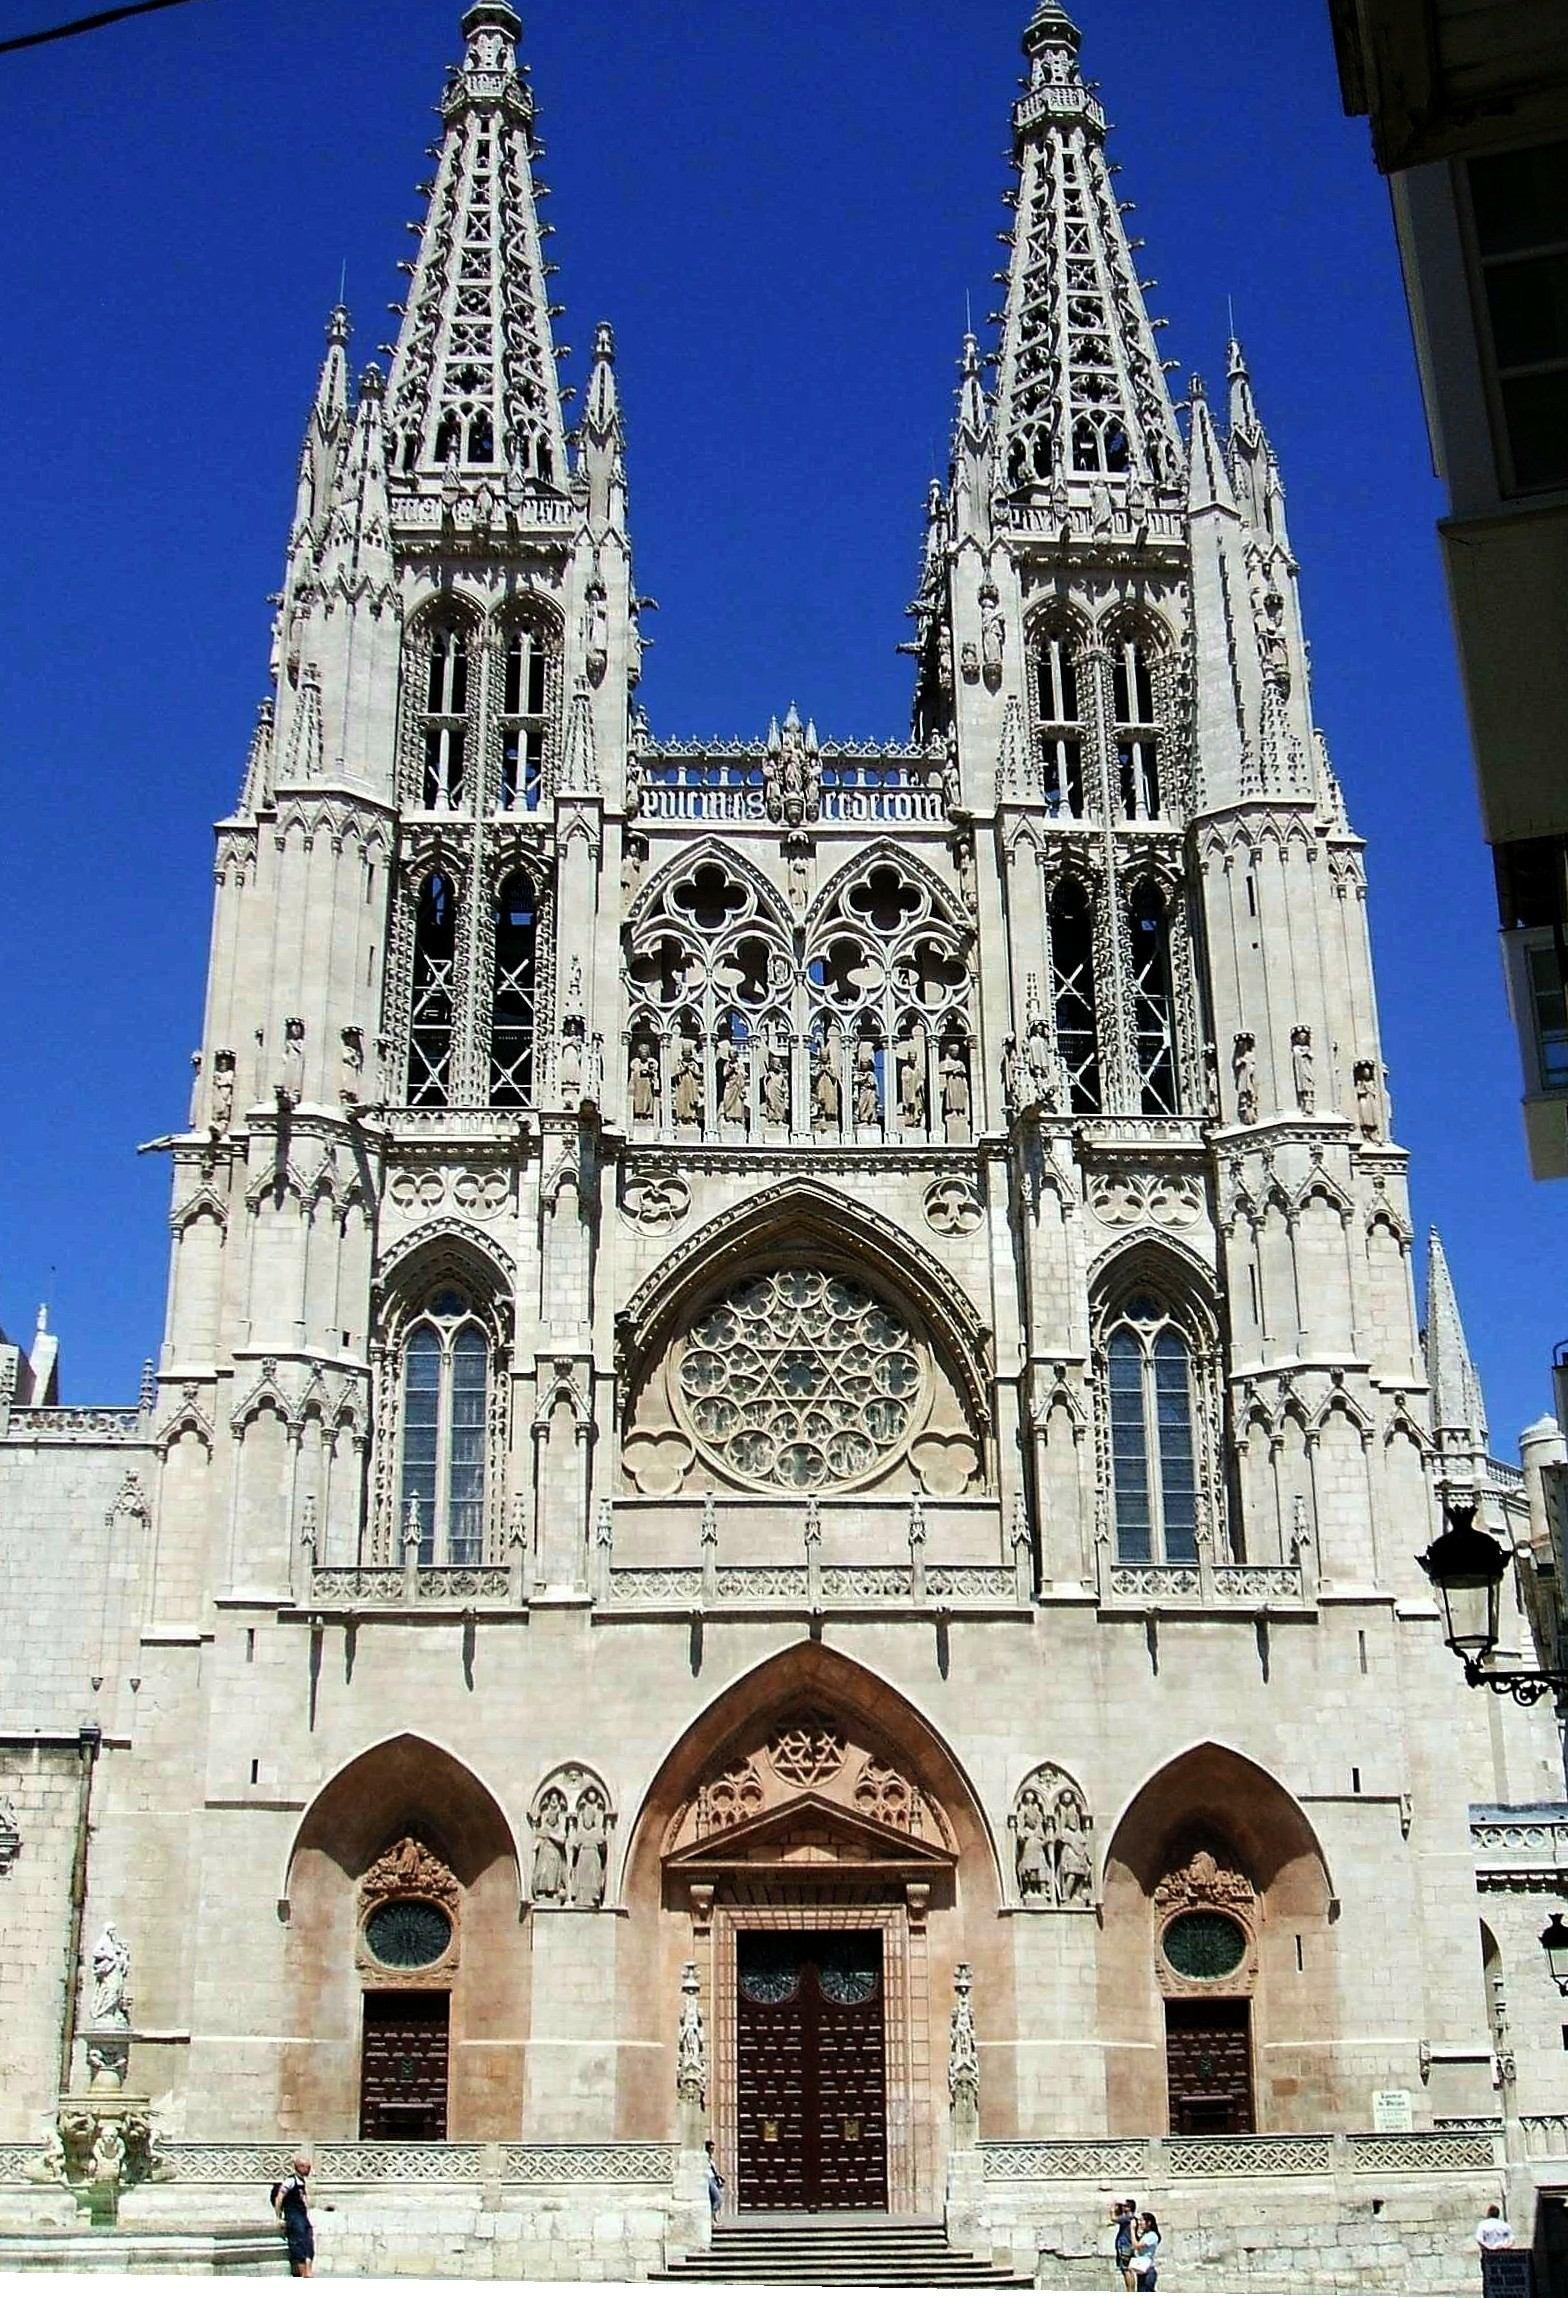 Catedral de Burgos © Zarateman